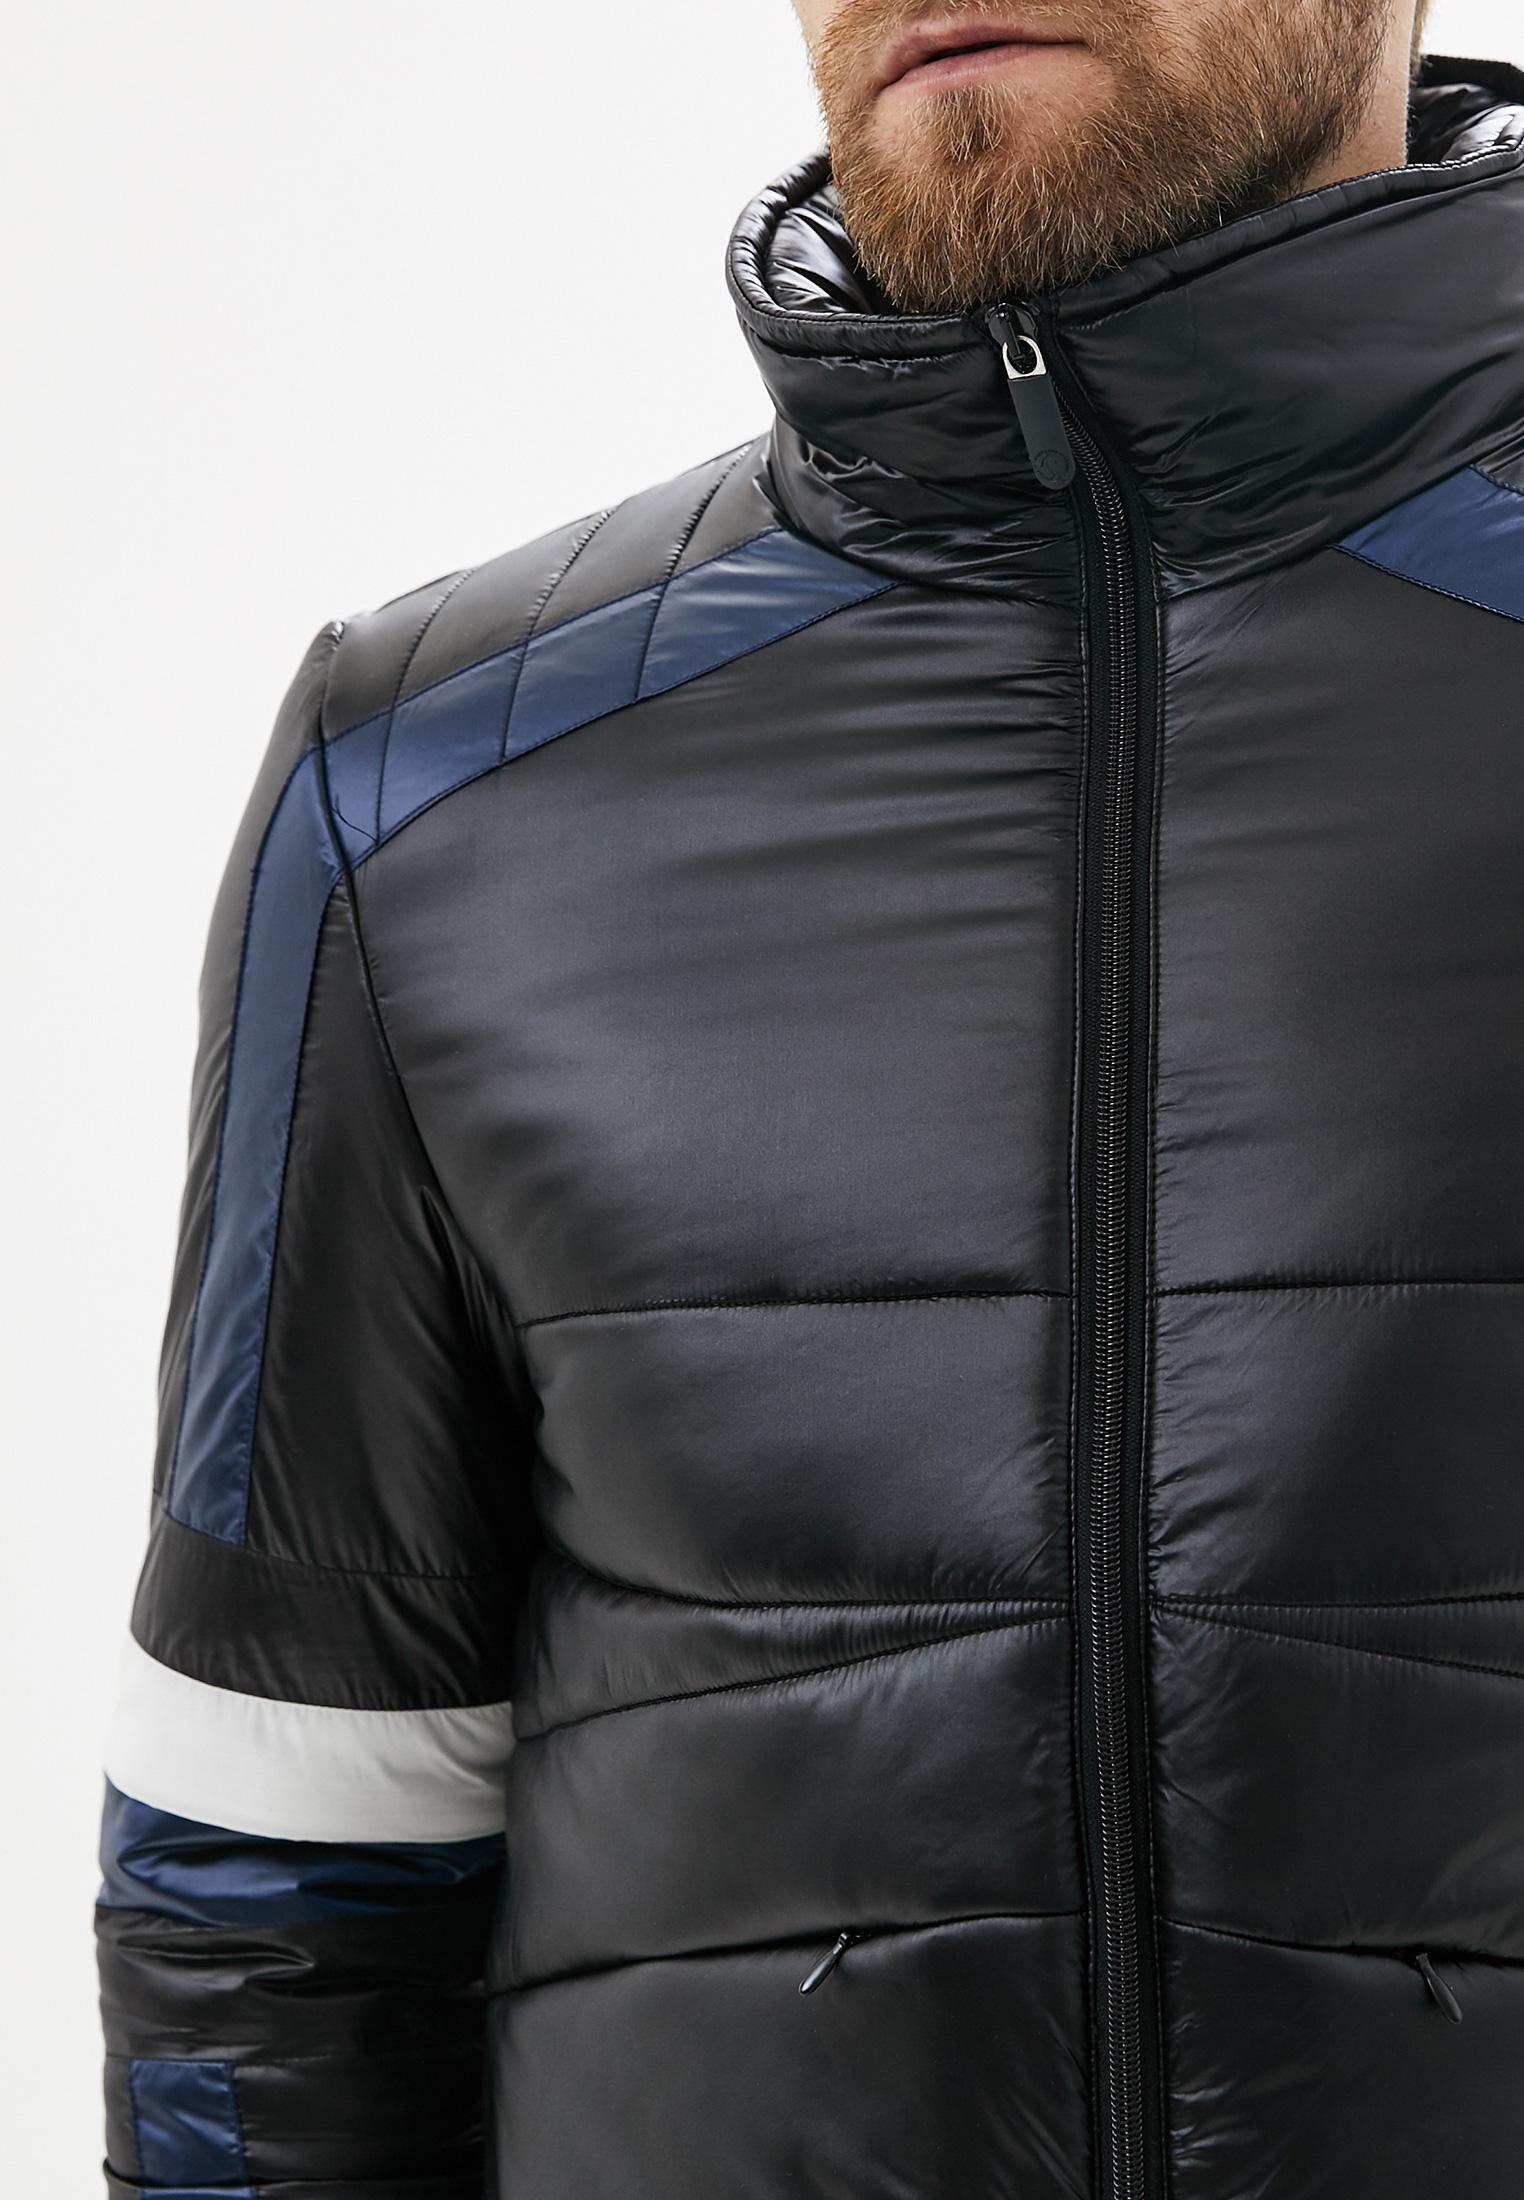 Мужская куртка Bikkembergs (Биккембергс) C H 082 01 T 9846: изображение 5